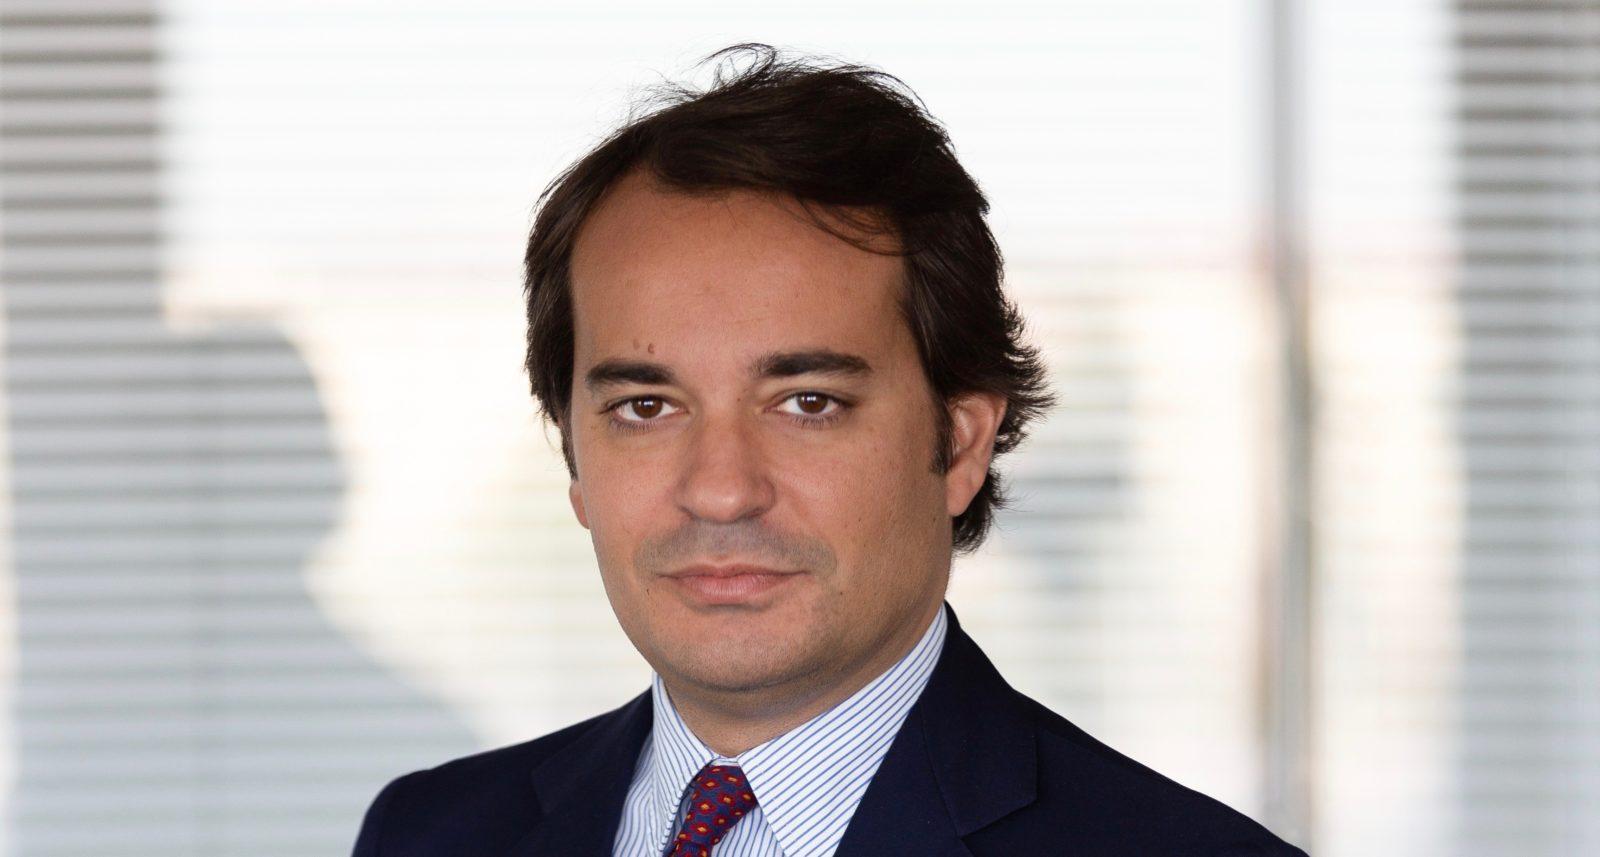 Antonio Garufi, gérant principal du fonds DECALIA Circular Economy